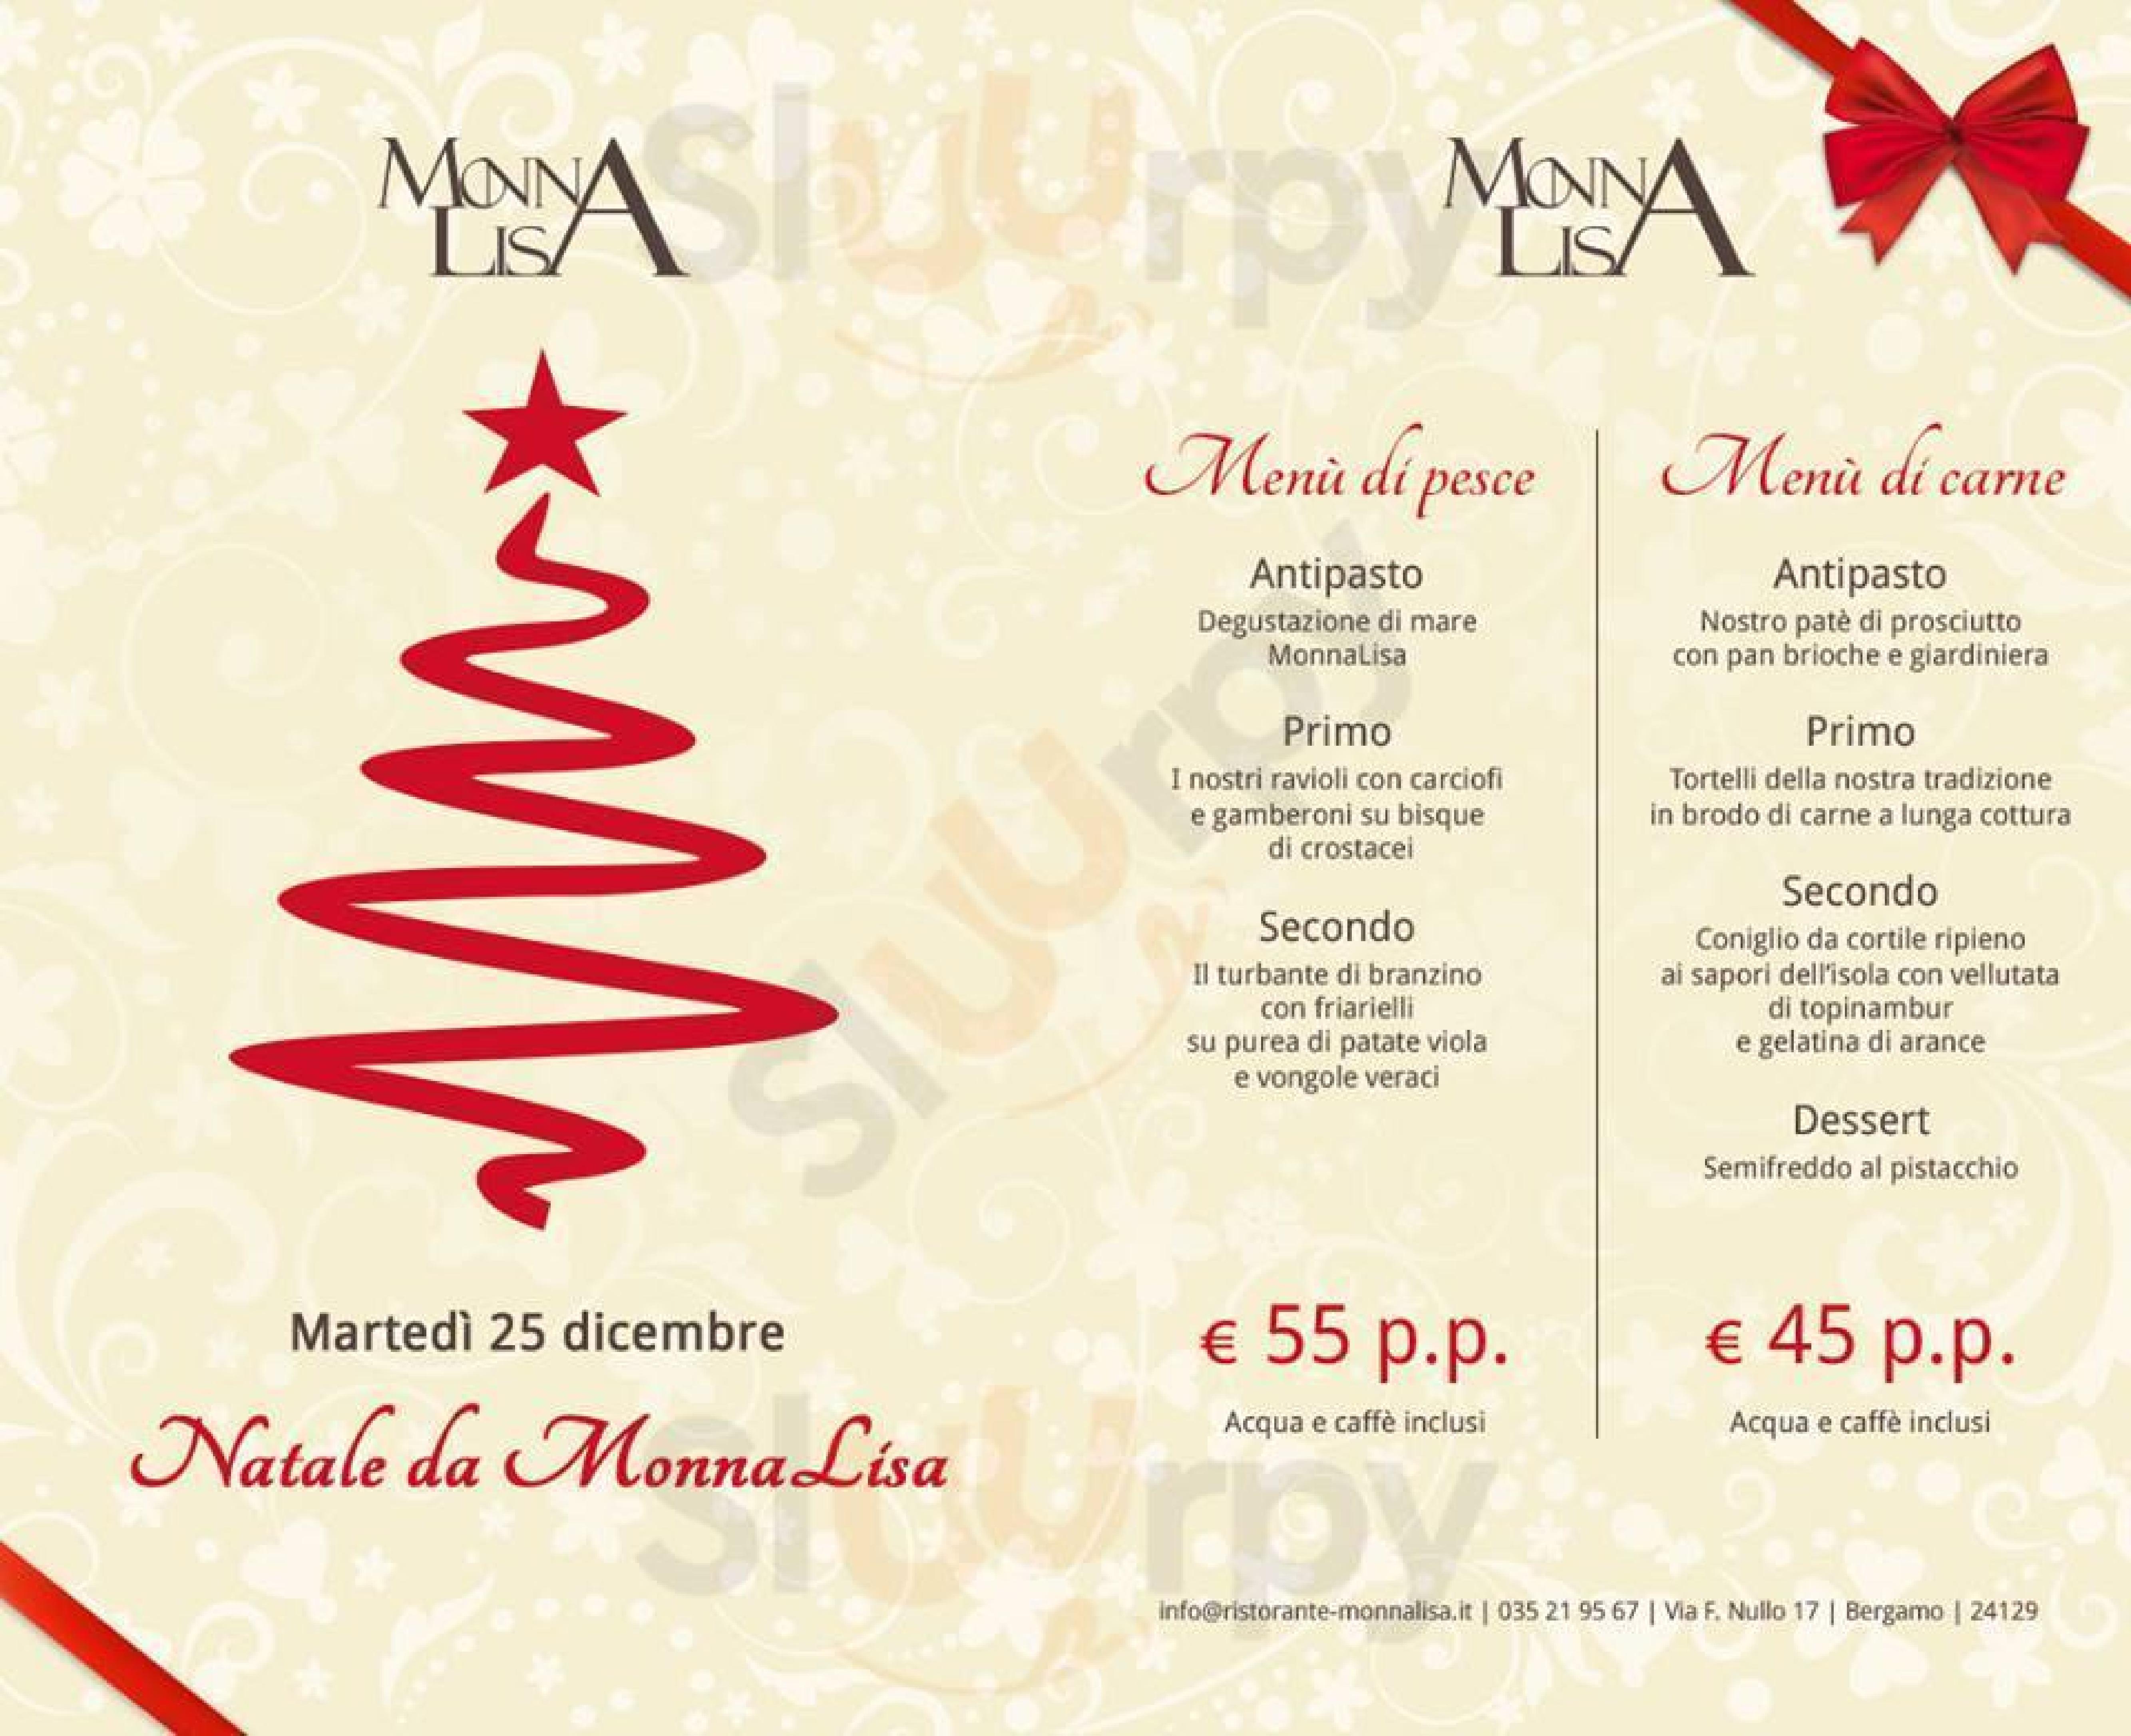 Menu Di Natale Bergamo.Menu Monna Lisa Bergamo Specialita E Piatti Del Menu Natale 2018